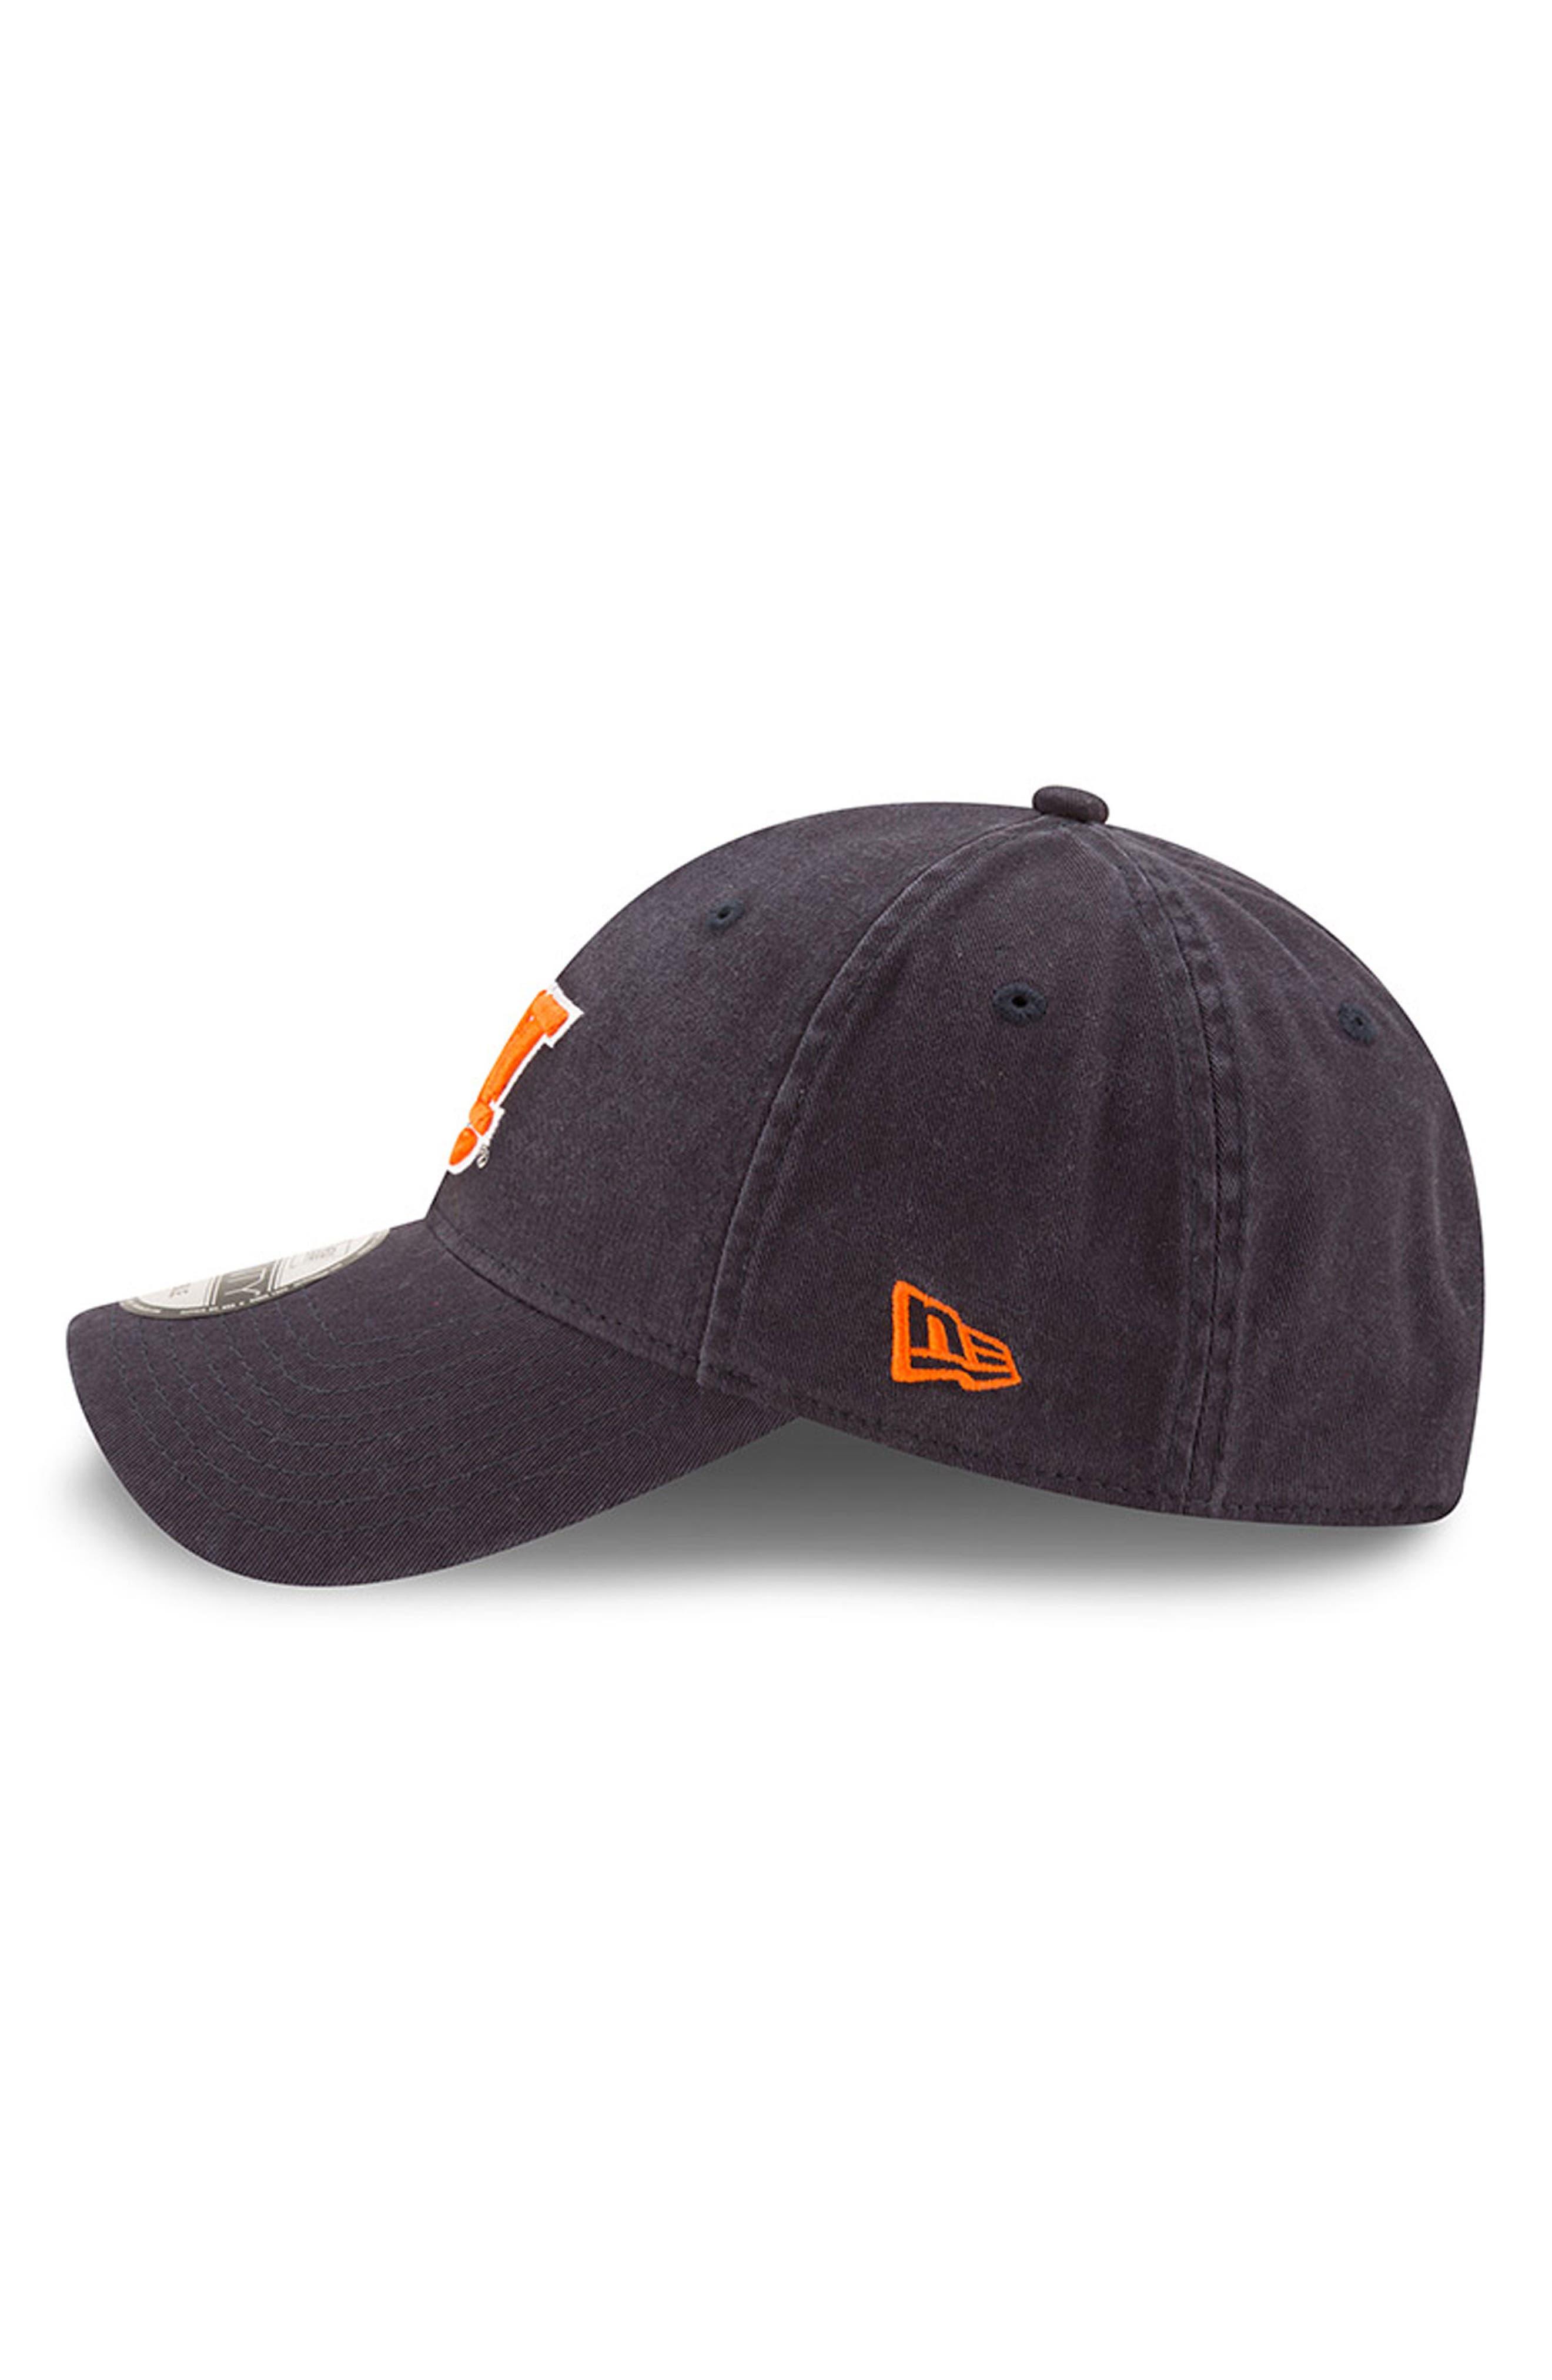 New Era Collegiate Core Classic - Auburn Tigers Baseball Cap,                             Alternate thumbnail 4, color,                             Auburn Tigers